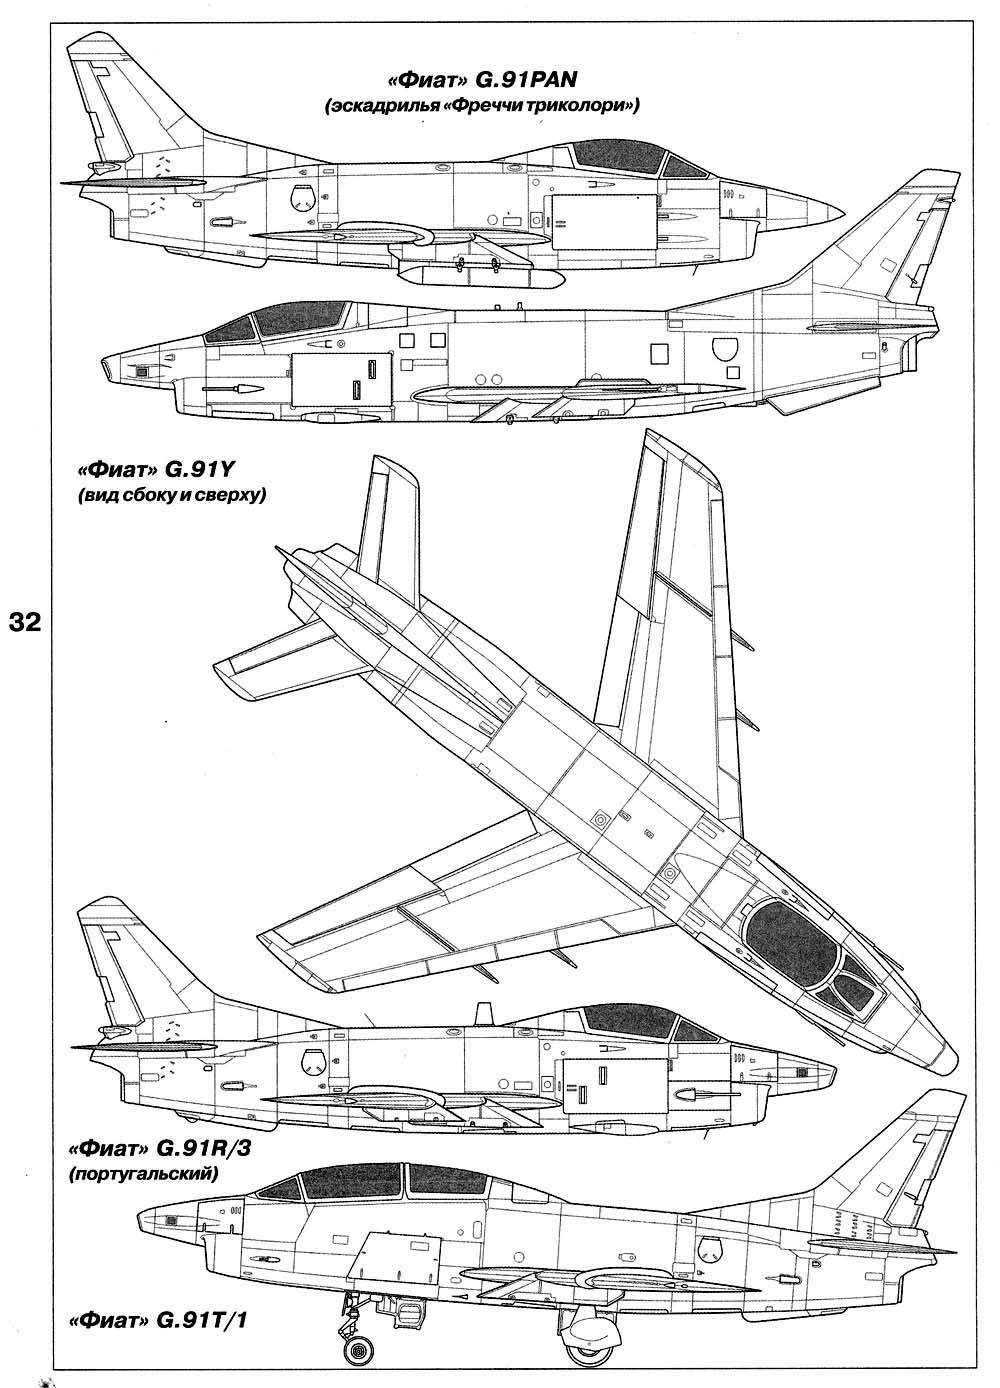 Fiat G.91 blueprint